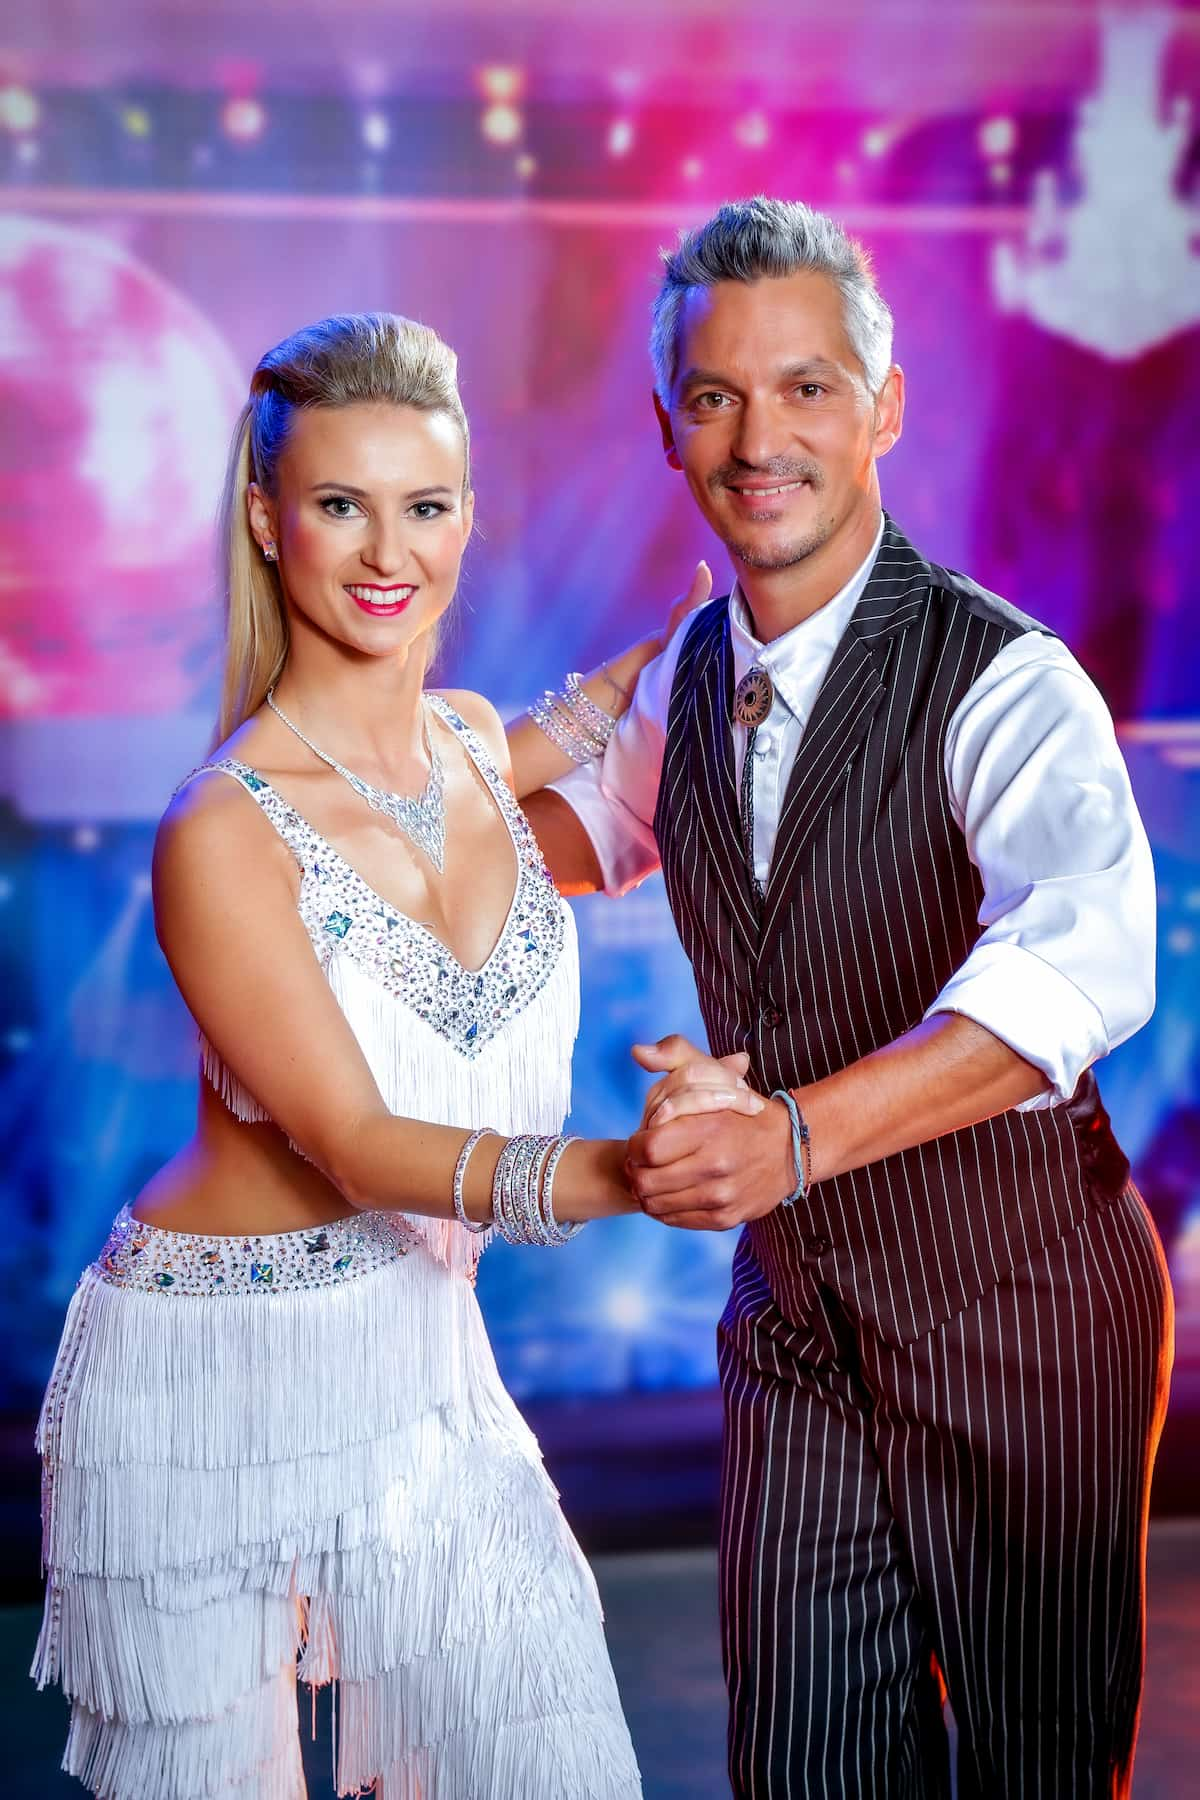 Kati Kallus und Faris Rahoma - Dancing Stars 8.10.2021